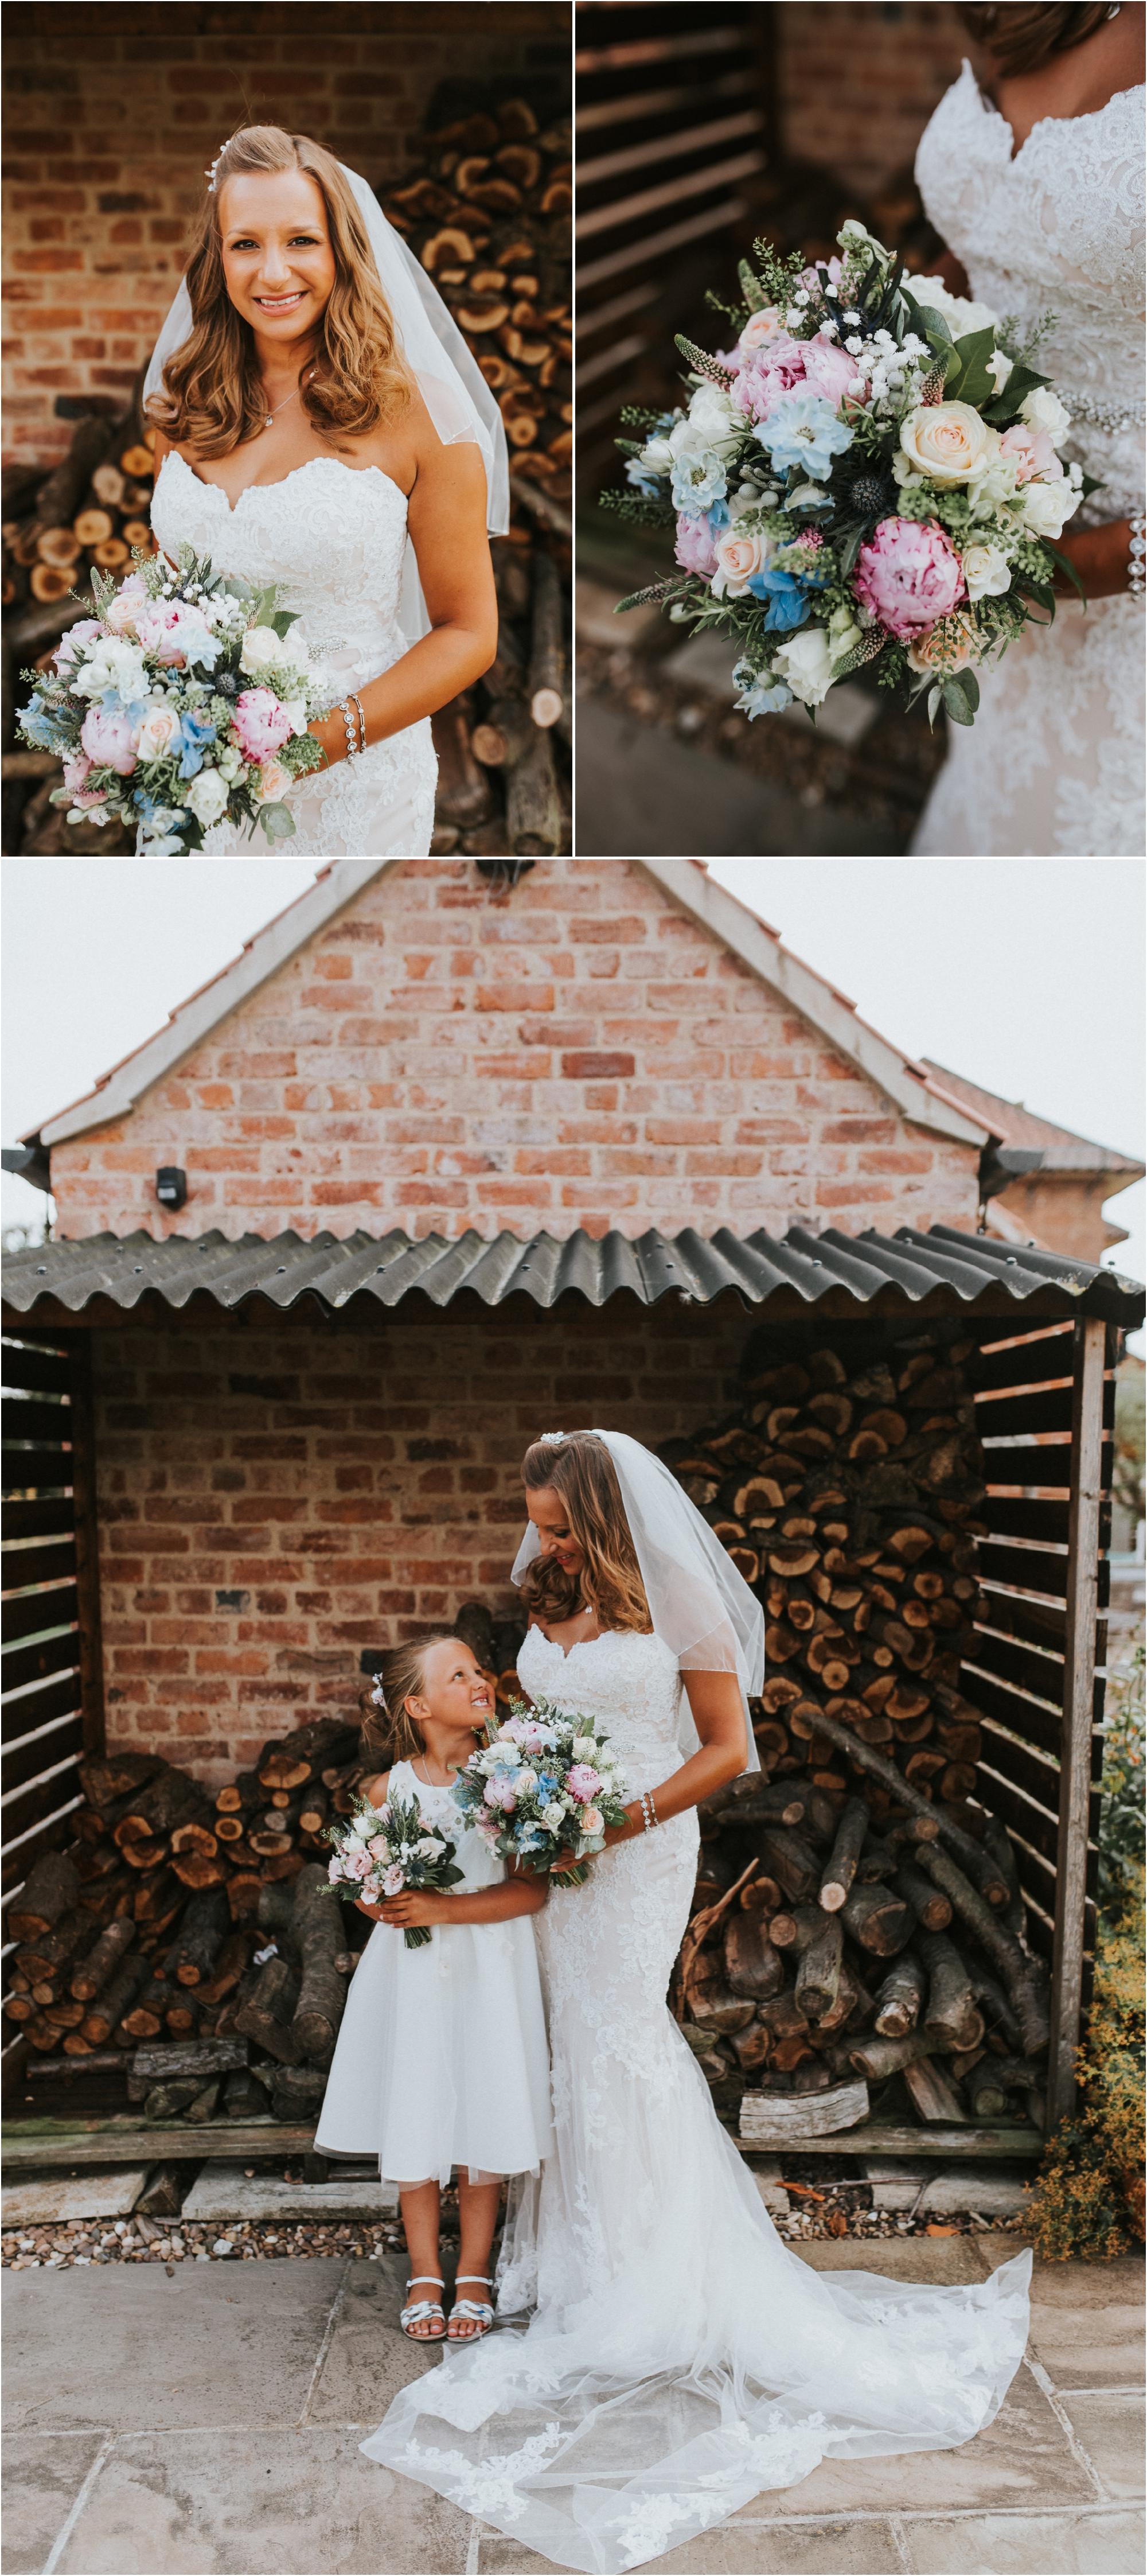 PheasantBrewery-LukeHolroyd-Yorkshirewedding_00095.jpg